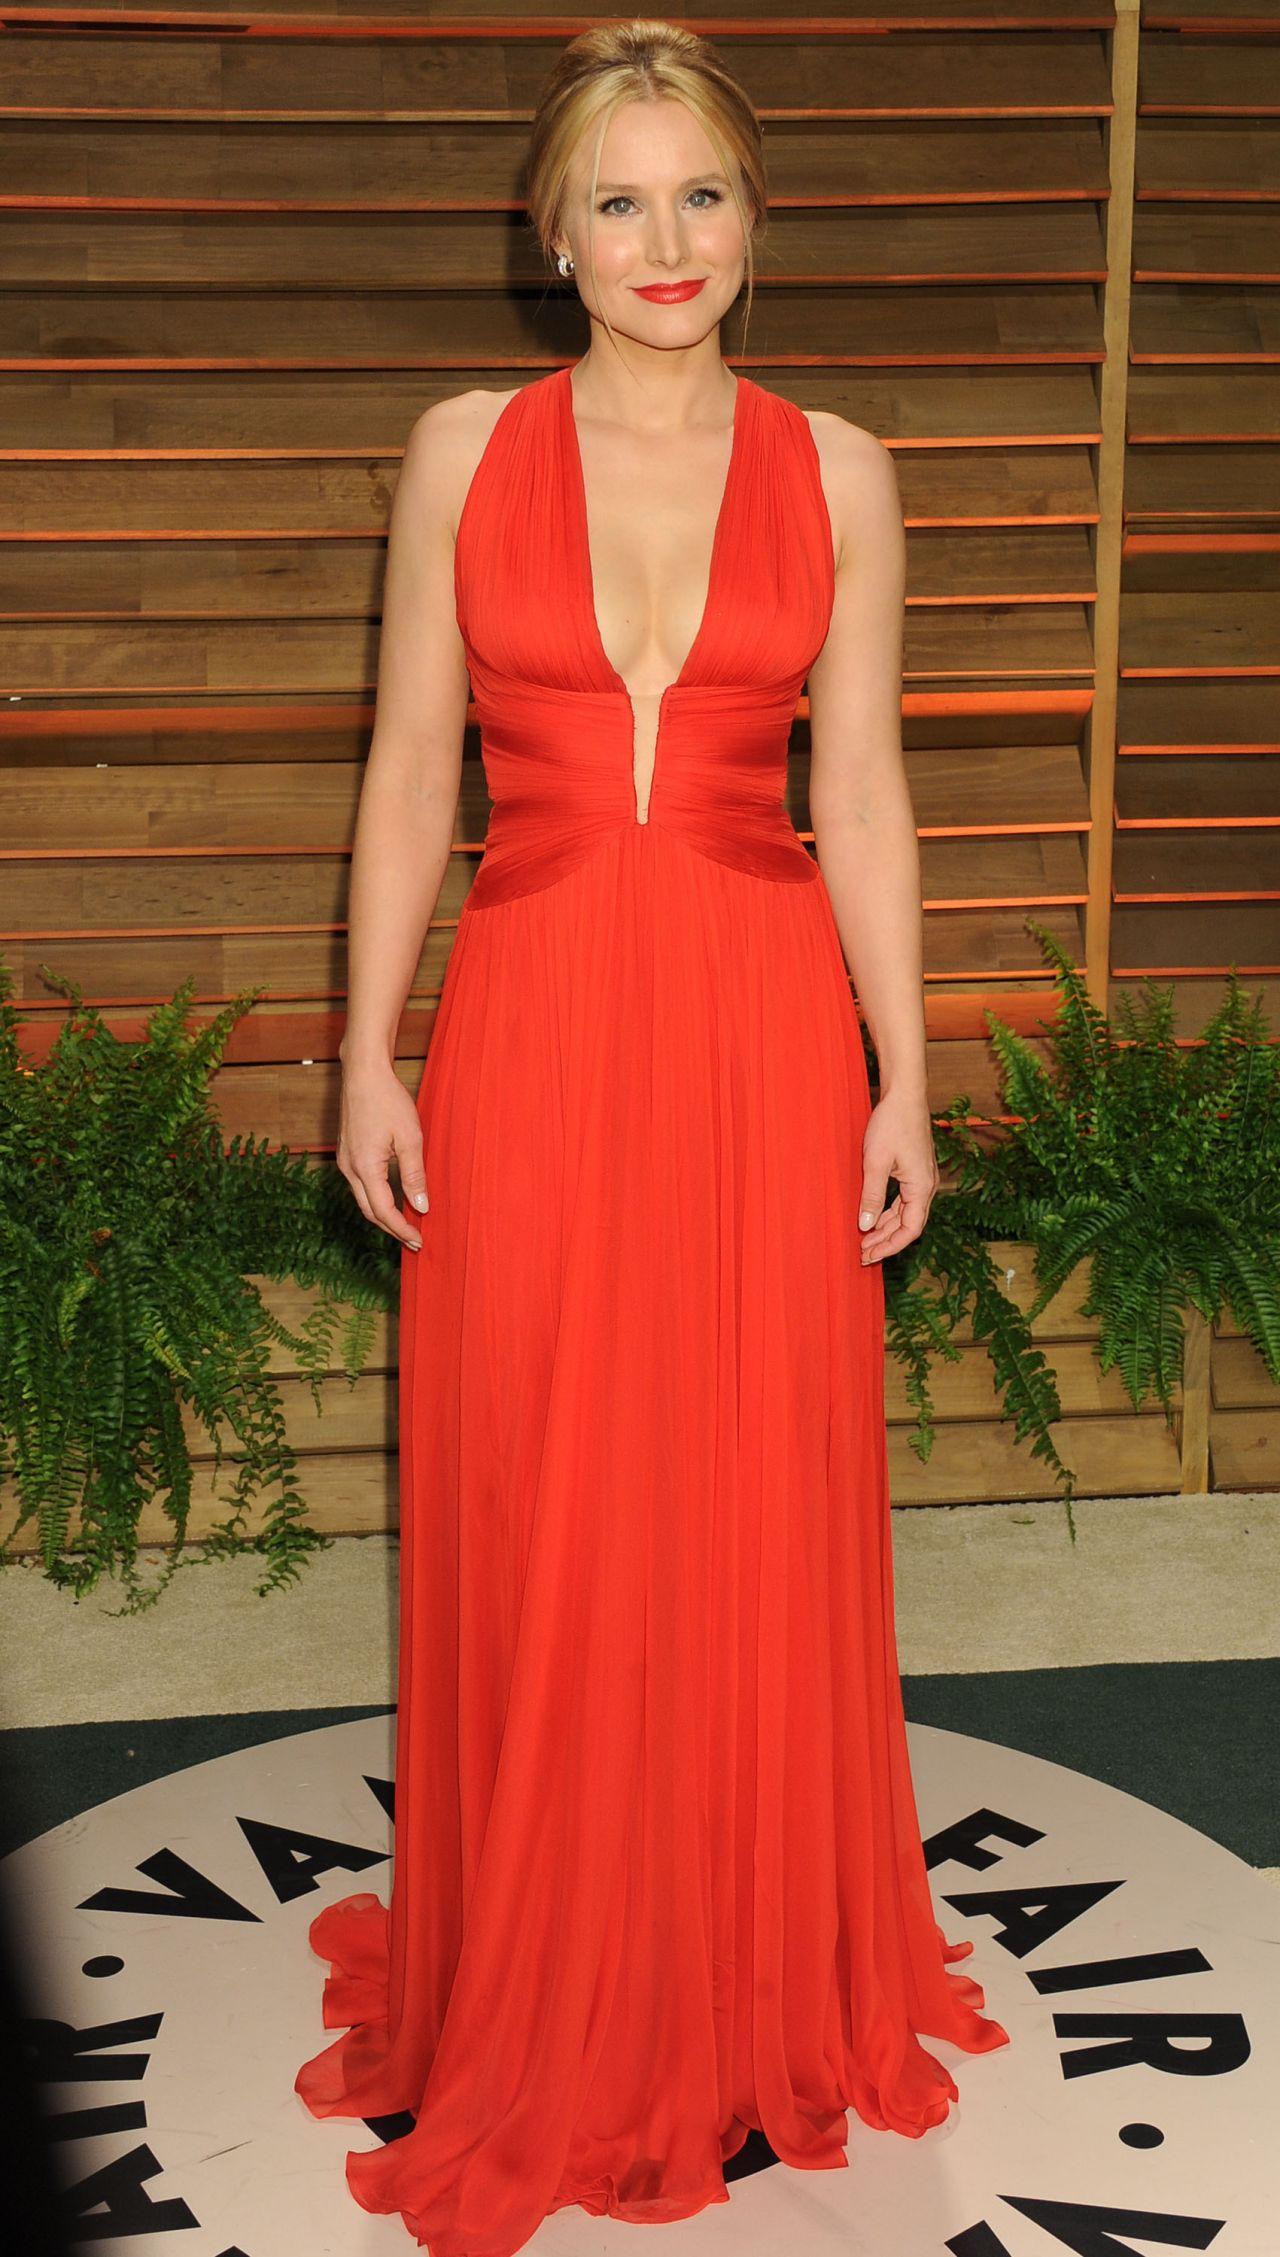 Kristen Bell In Zuhair Murad Red Gown 2014 Vanity Fair